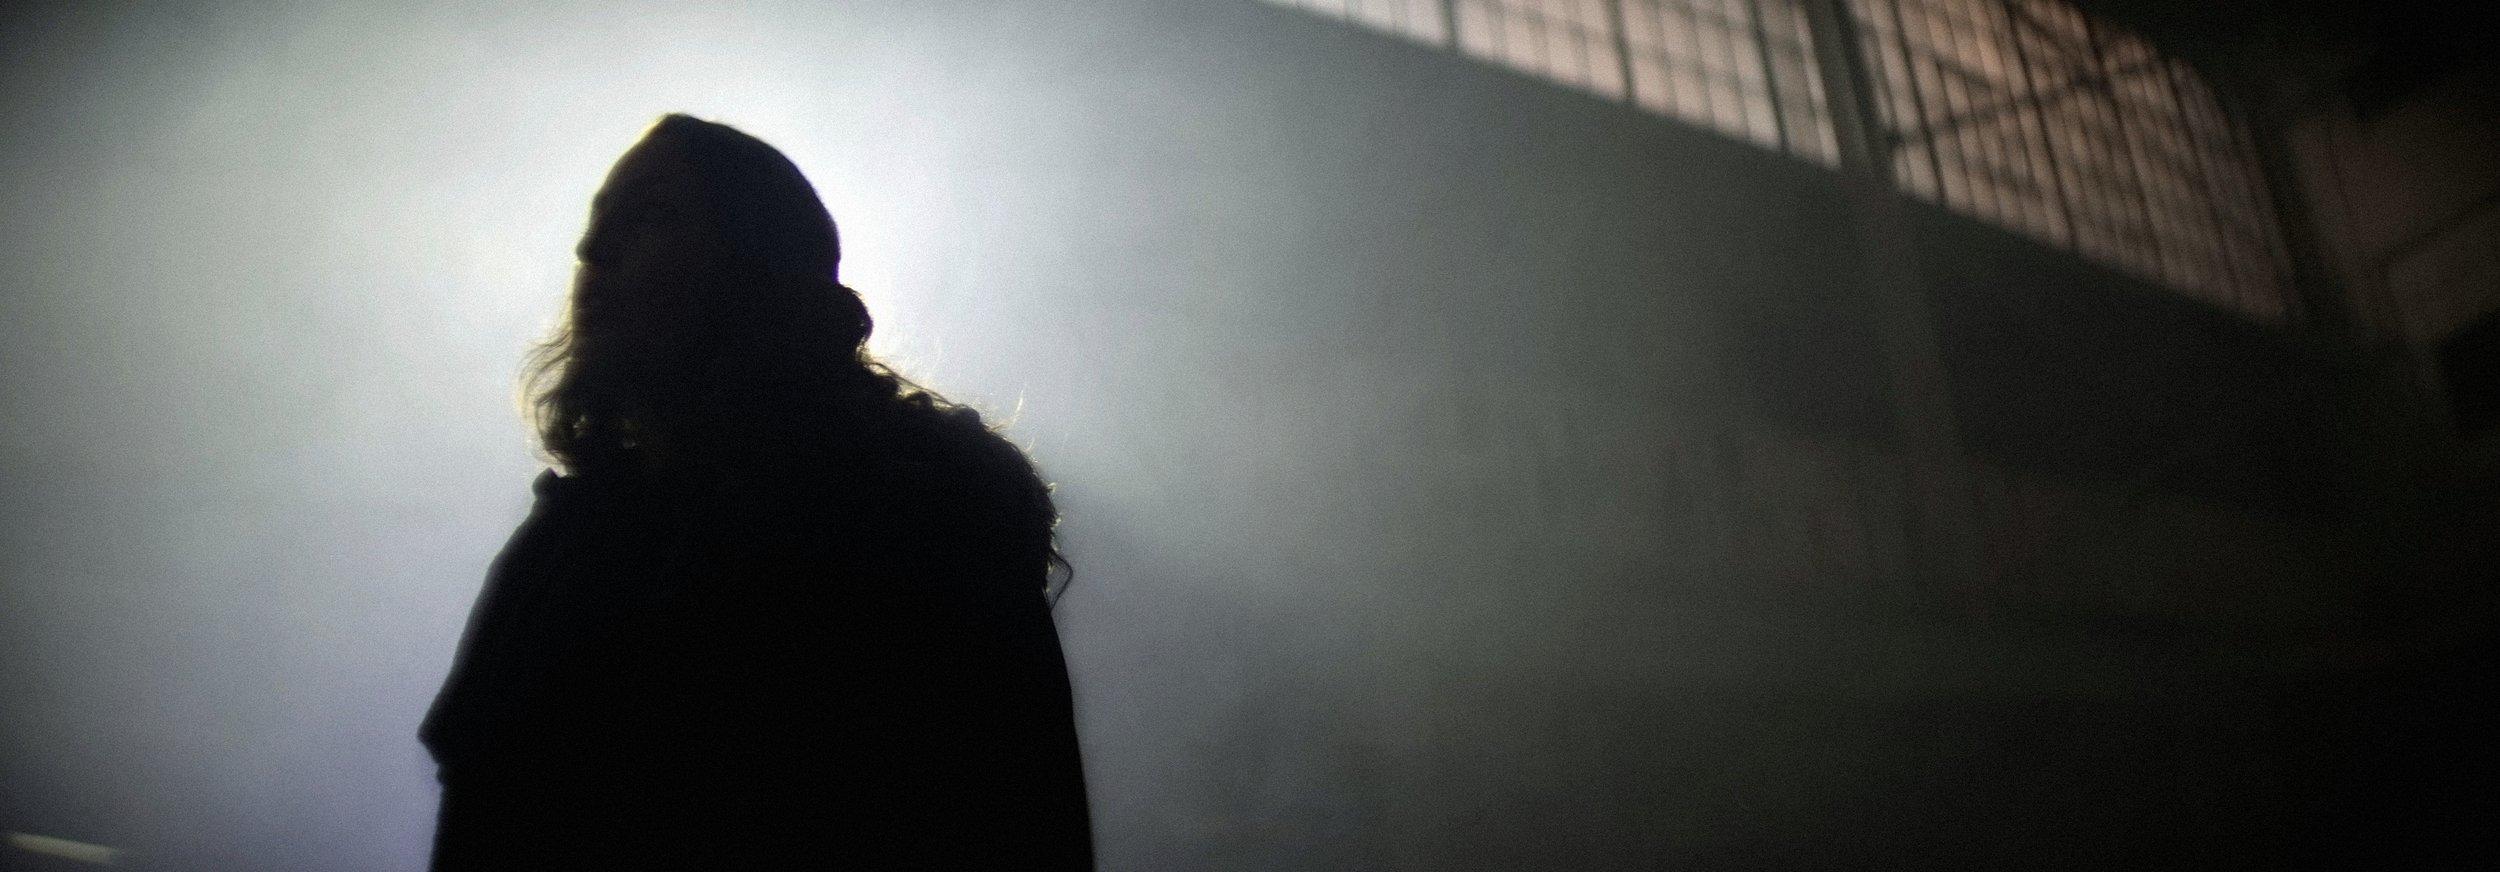 Olivia_Cineovision_35mm_3.JPG